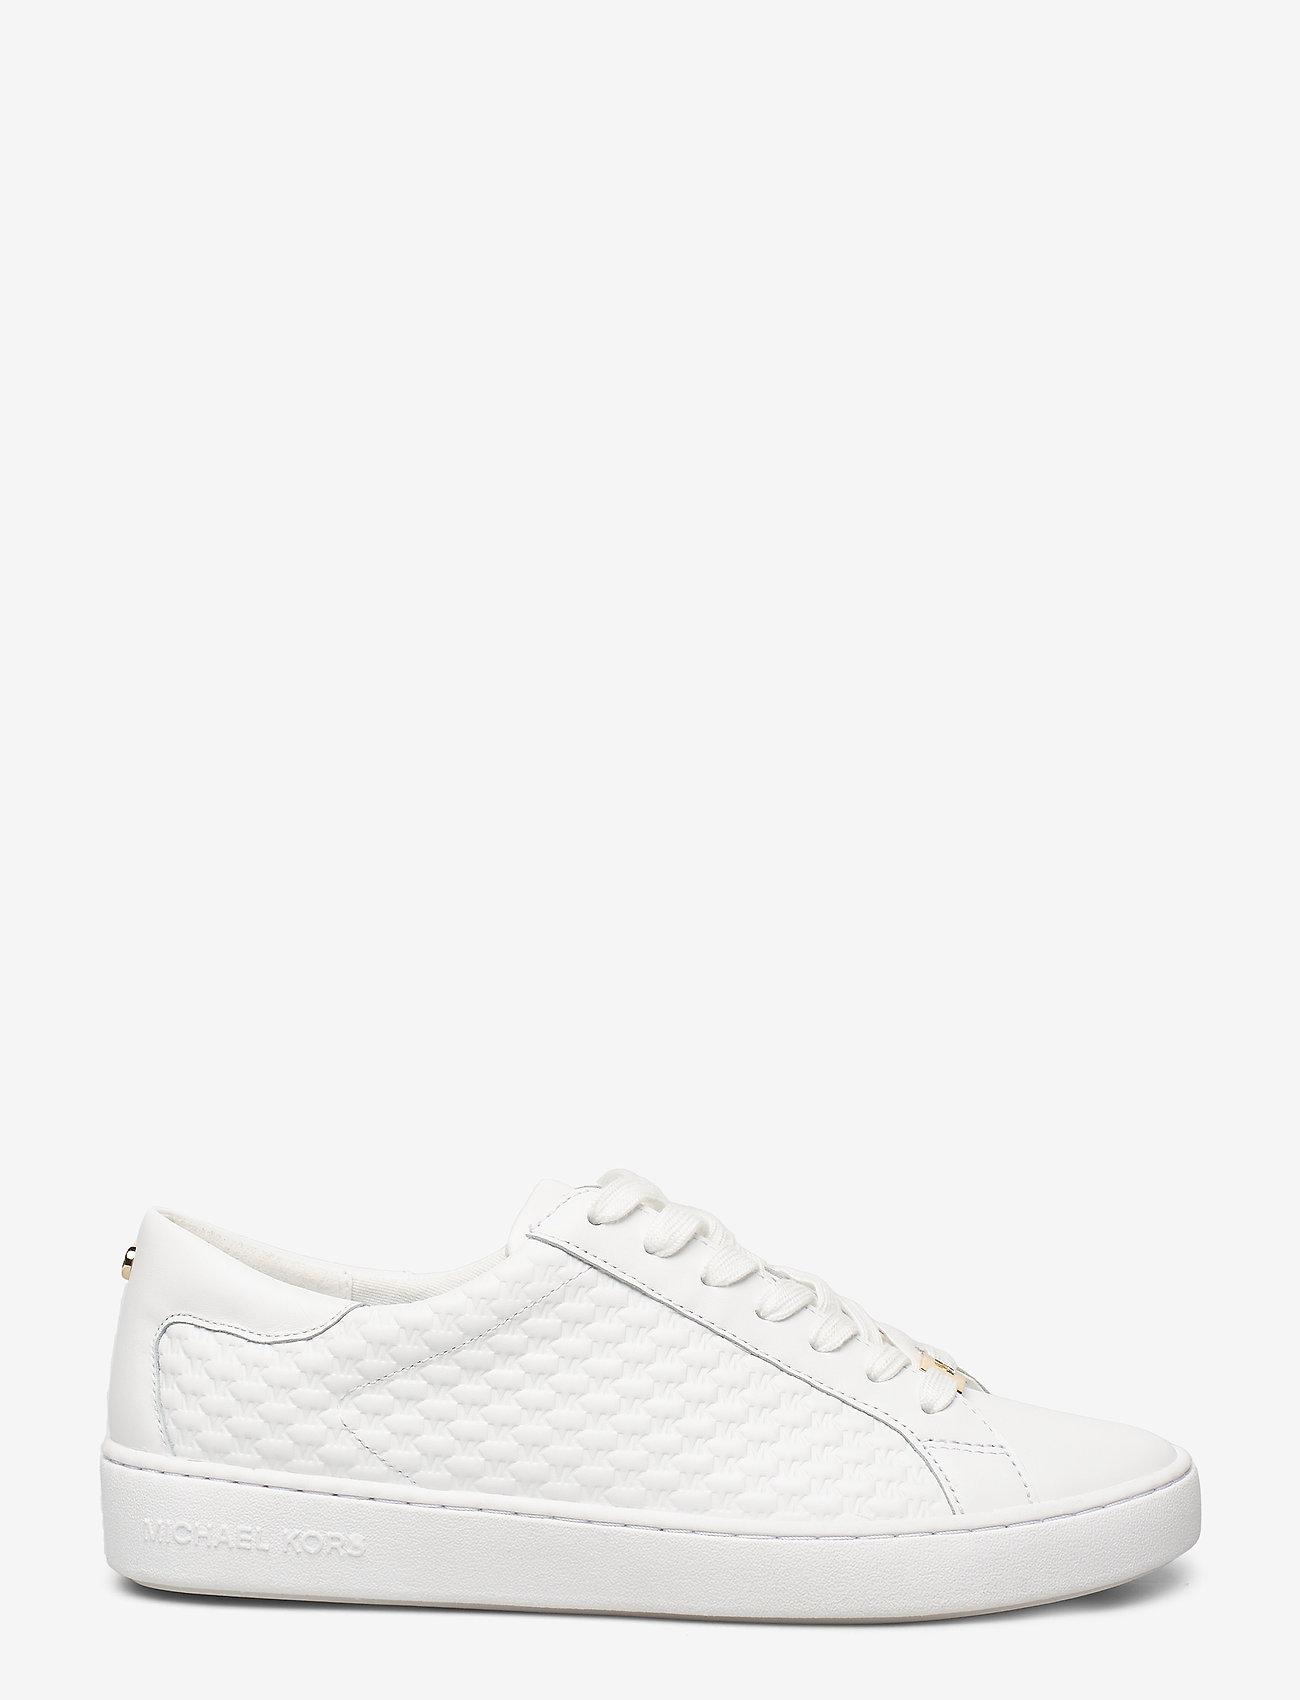 Michael Kors - COLBY SNEAKER - lage sneakers - optic white - 1